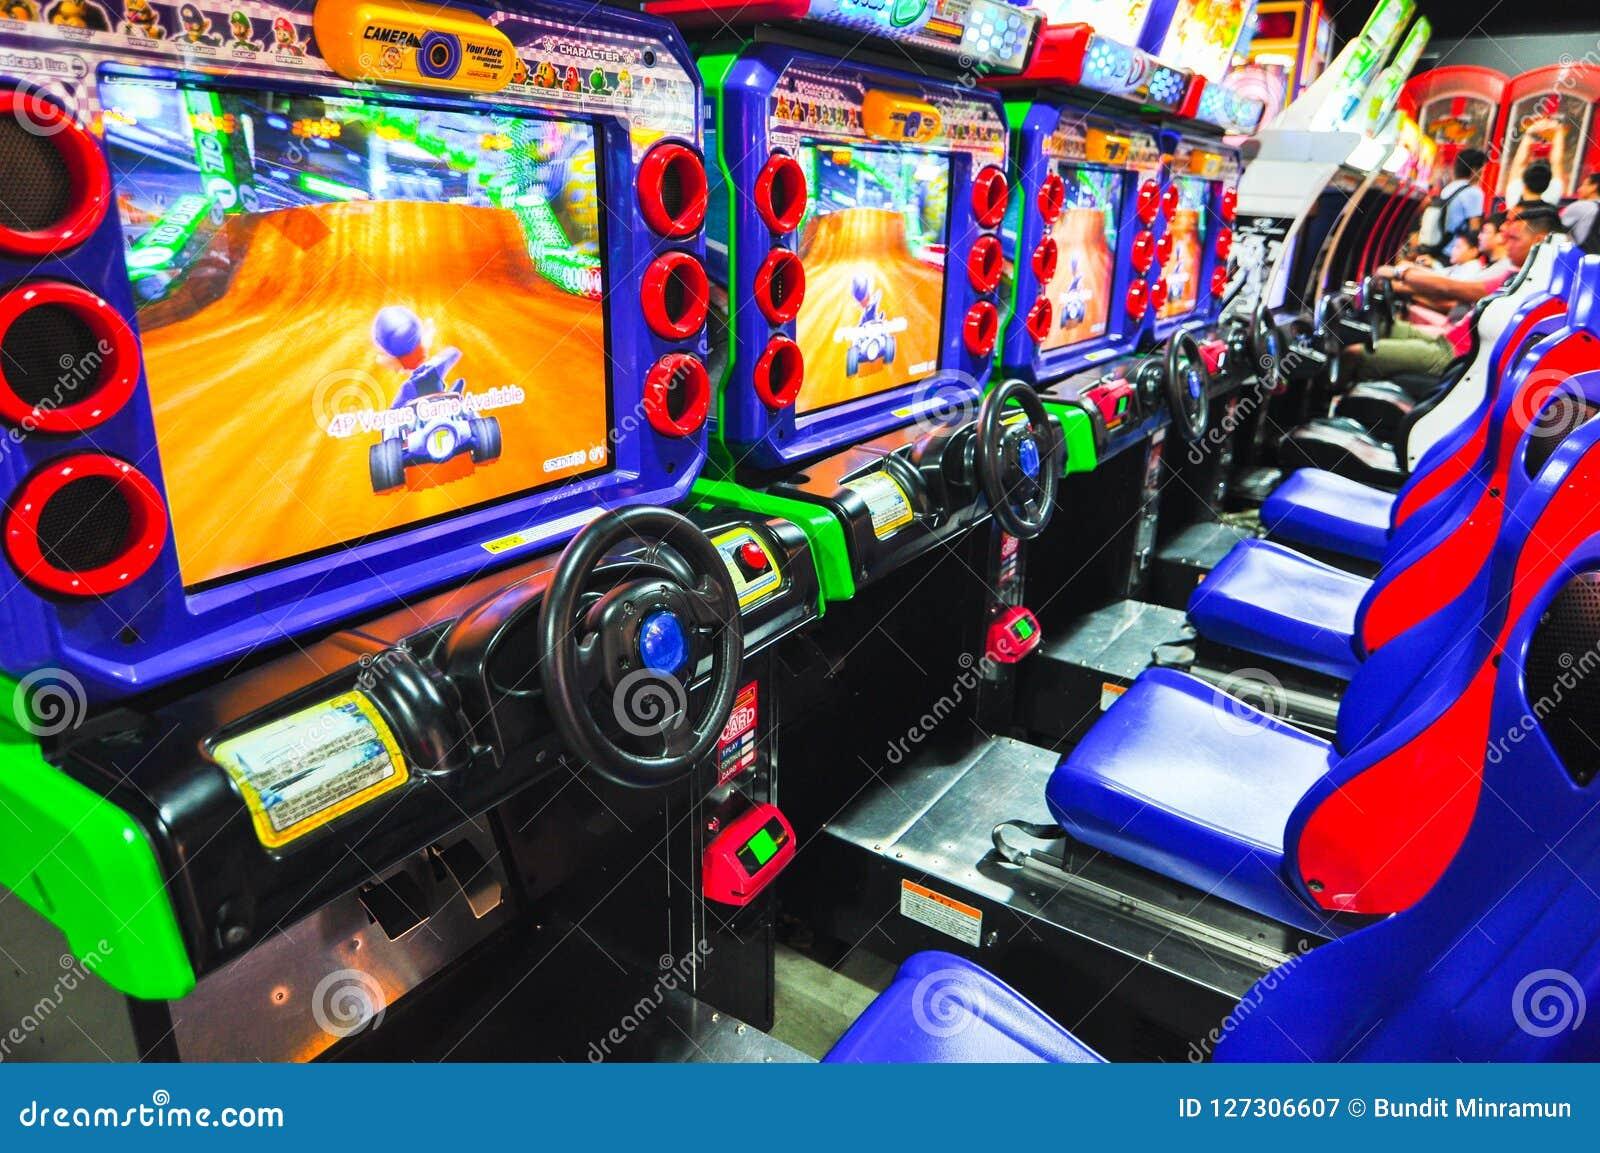 Super Mario Kart Racing Video Game Arcade At City Amusements